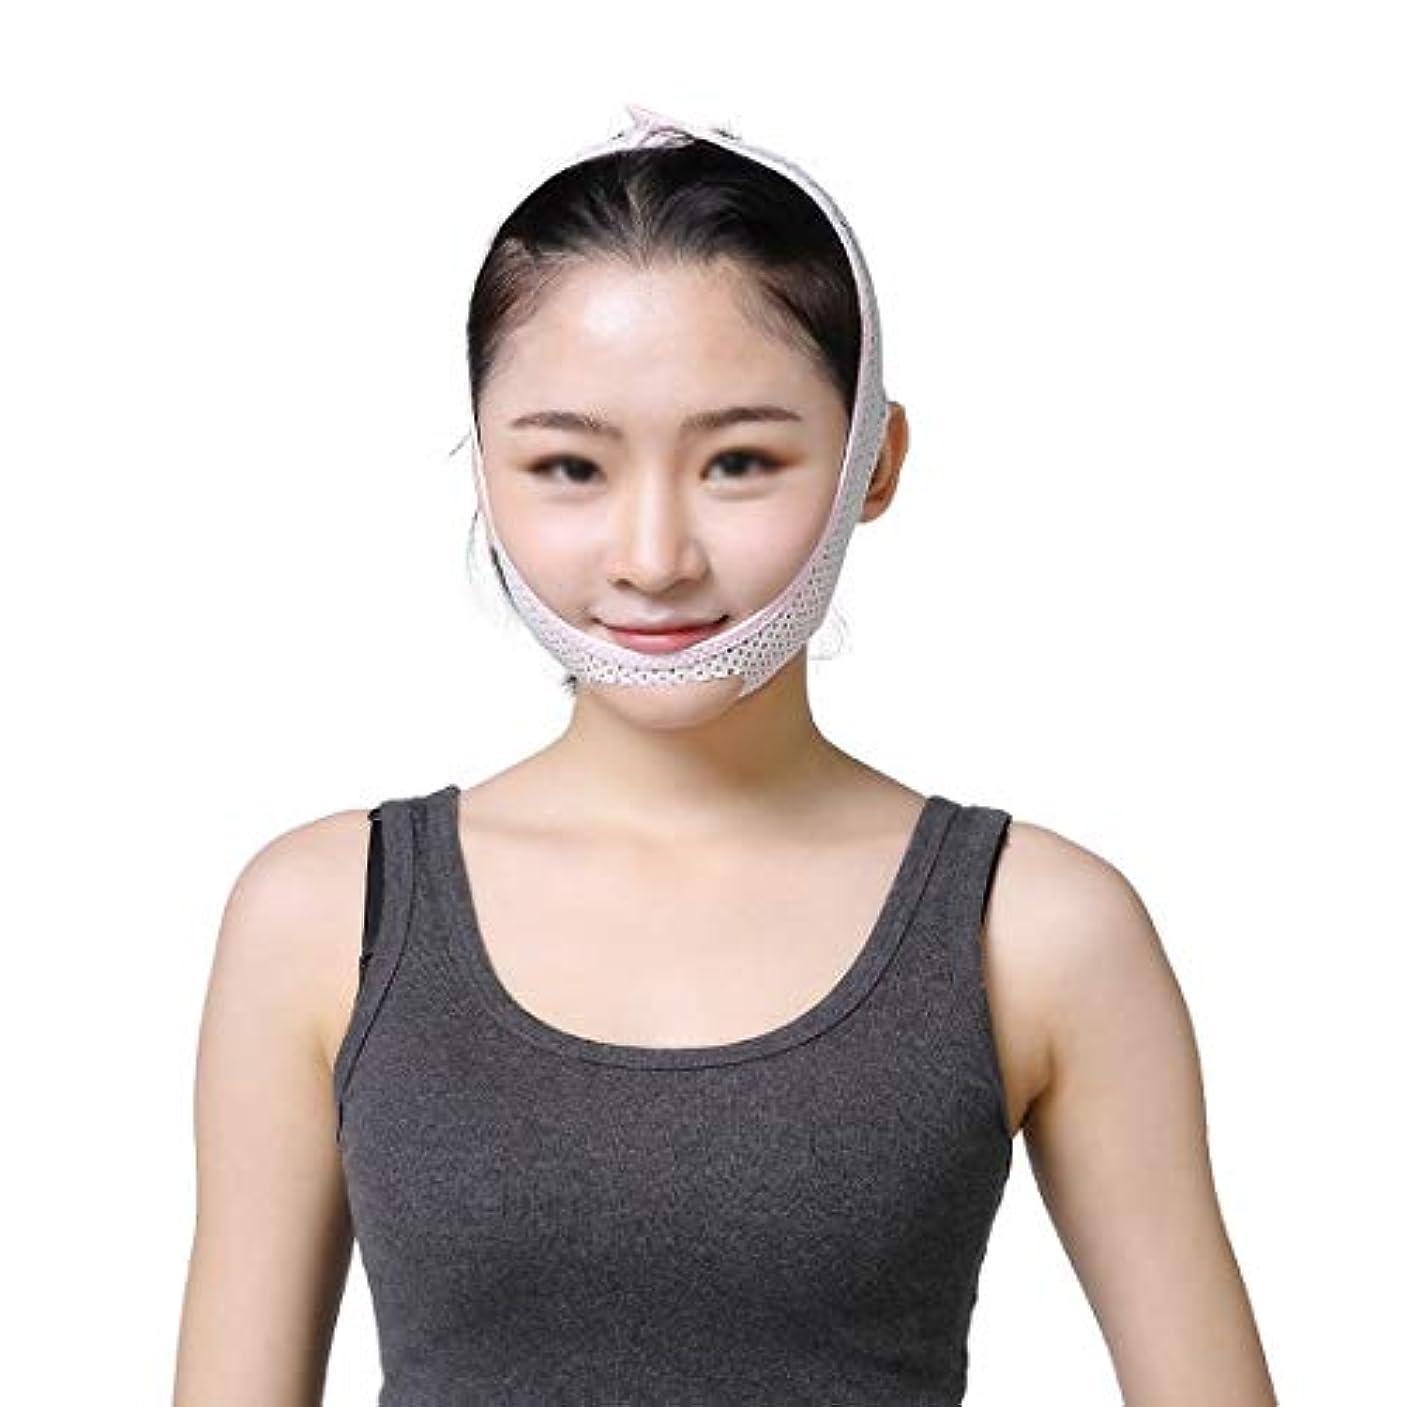 ZWBD フェイスマスク, 薄い顔包帯美容機器持ち上がる引き締めダブルチン判決V顔の引き締め痩身包帯引き締めフェイシャルマッサージ (Size : L)